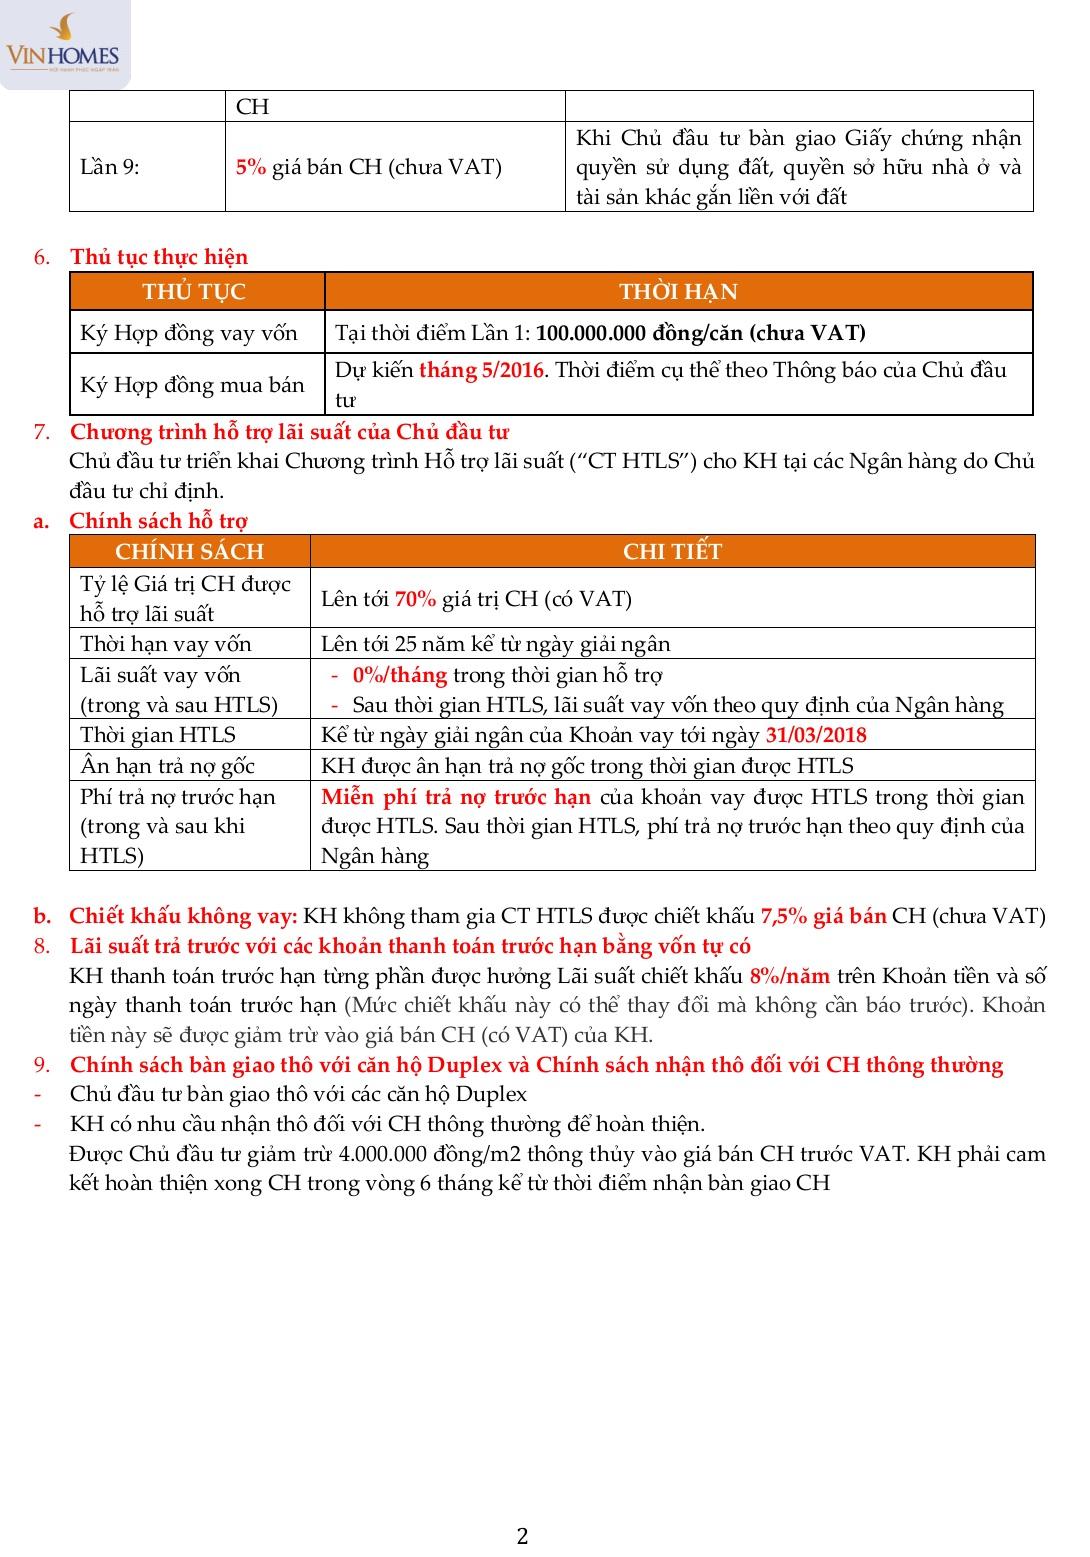 chinh-sach-ban-hang-vinhomes-gardenia-tu-ngay-01-04-20162